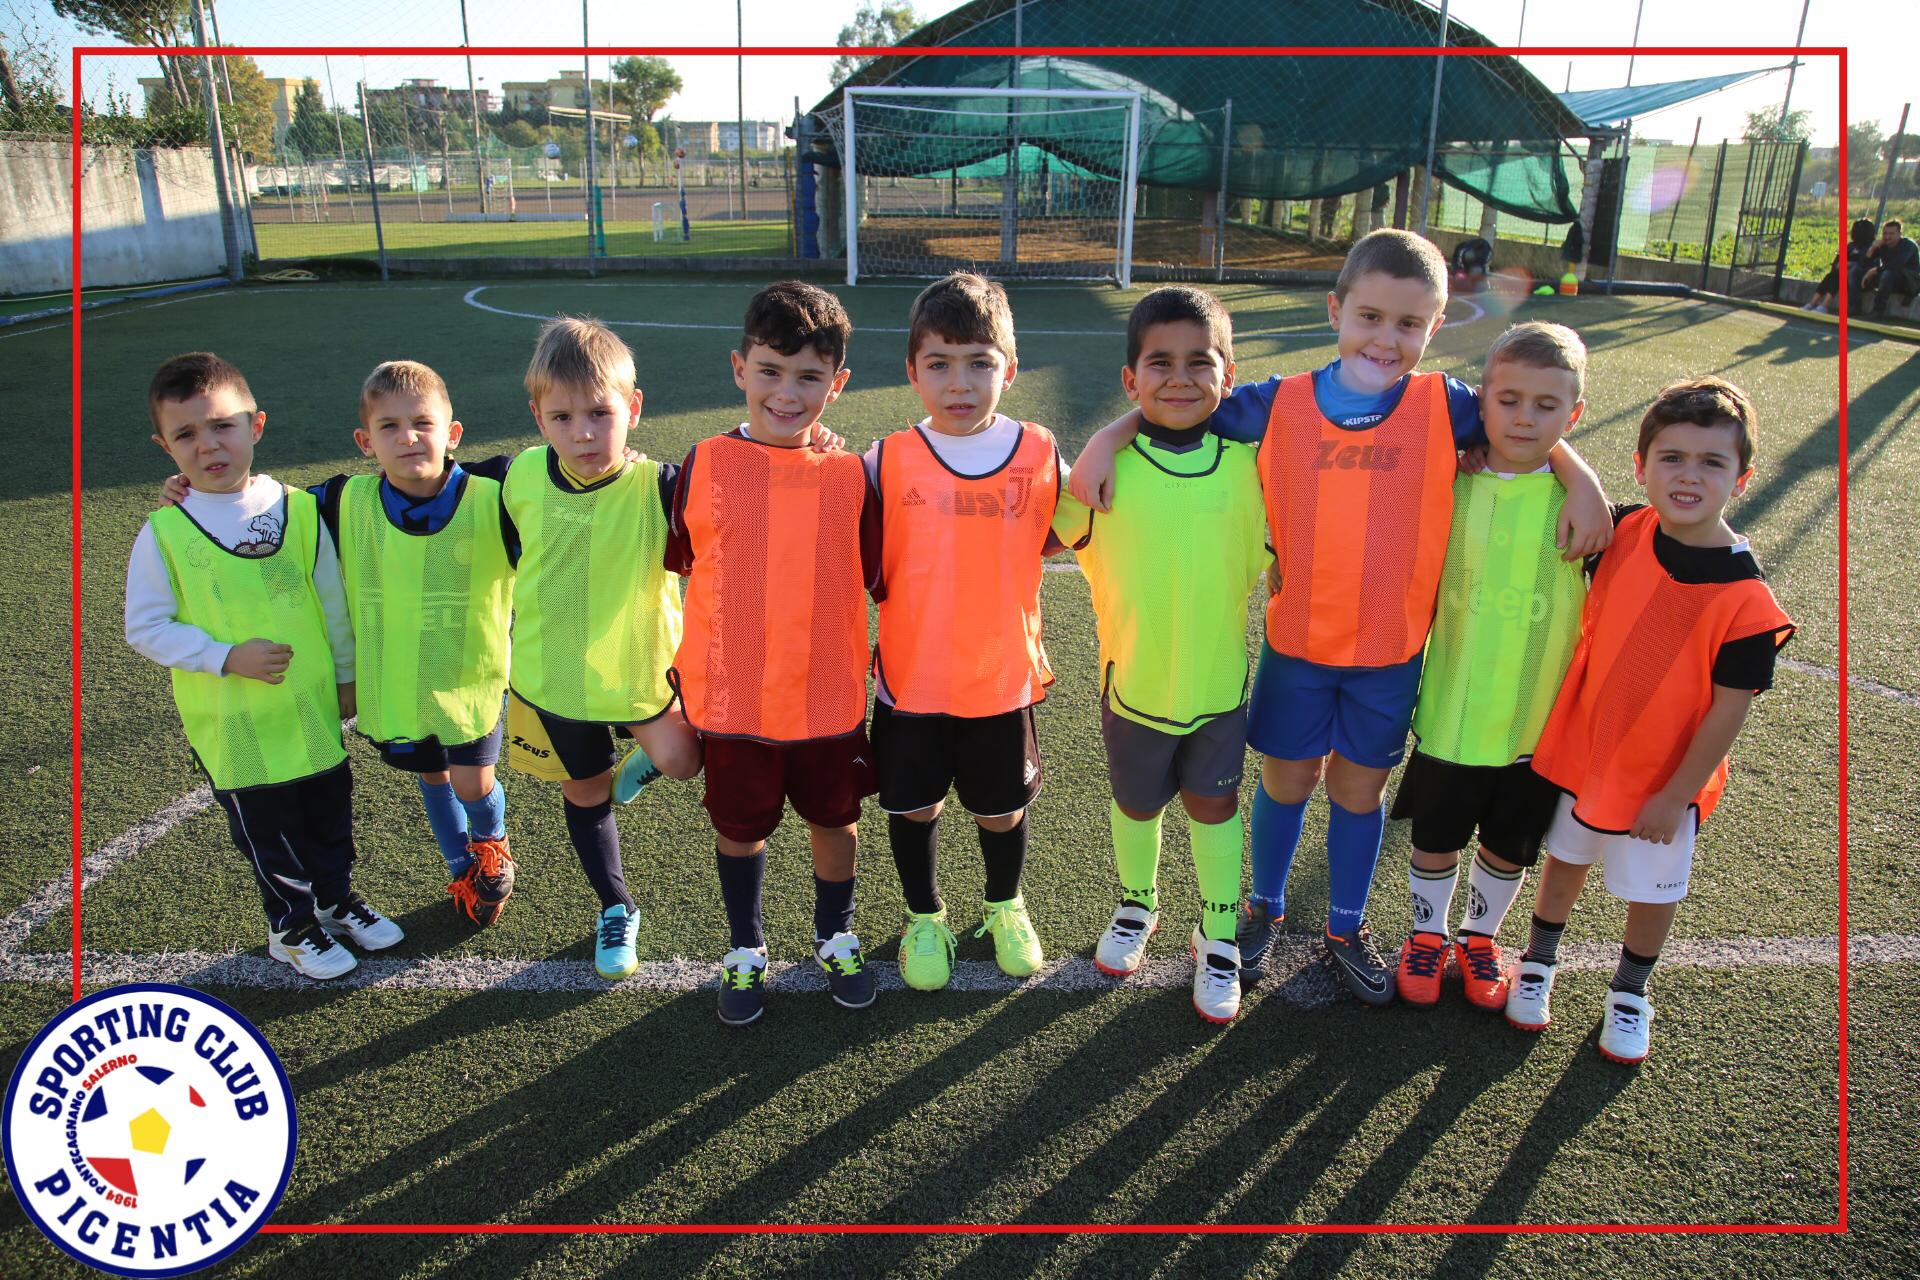 http://www.sportingpicentia.com/wp-content/uploads/2018/11/Piccoli-amici.png